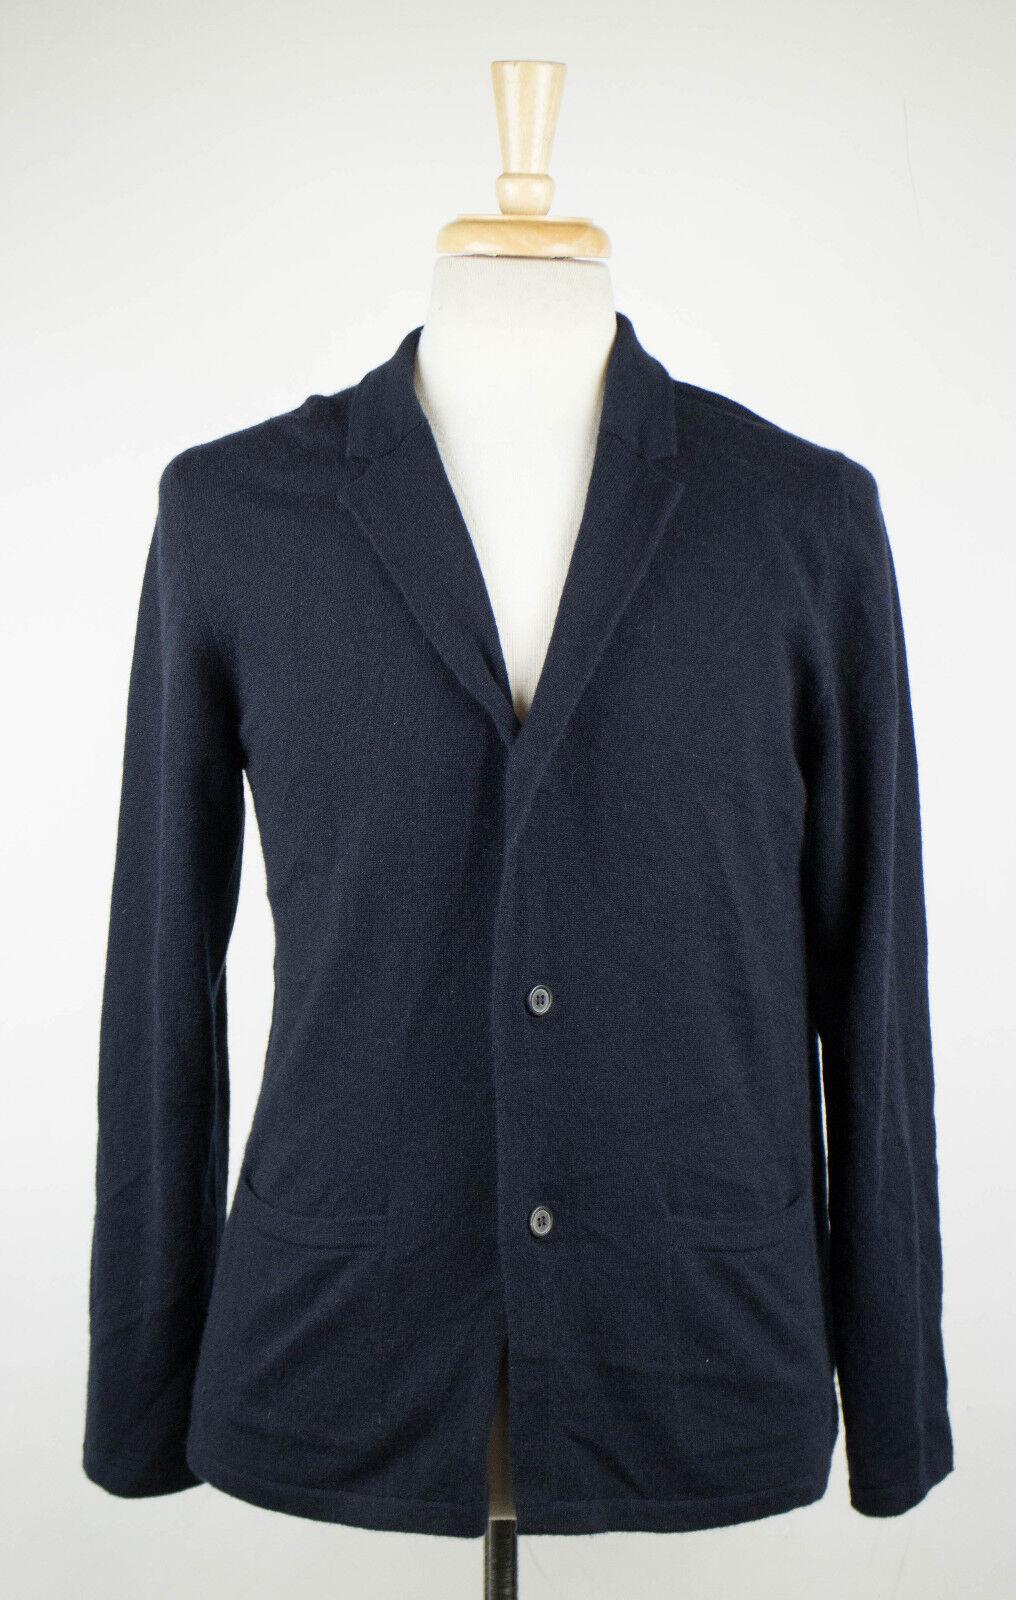 New. LANVIN Navy Blau Cashmere Cardigan Sweater Größe Small 1295